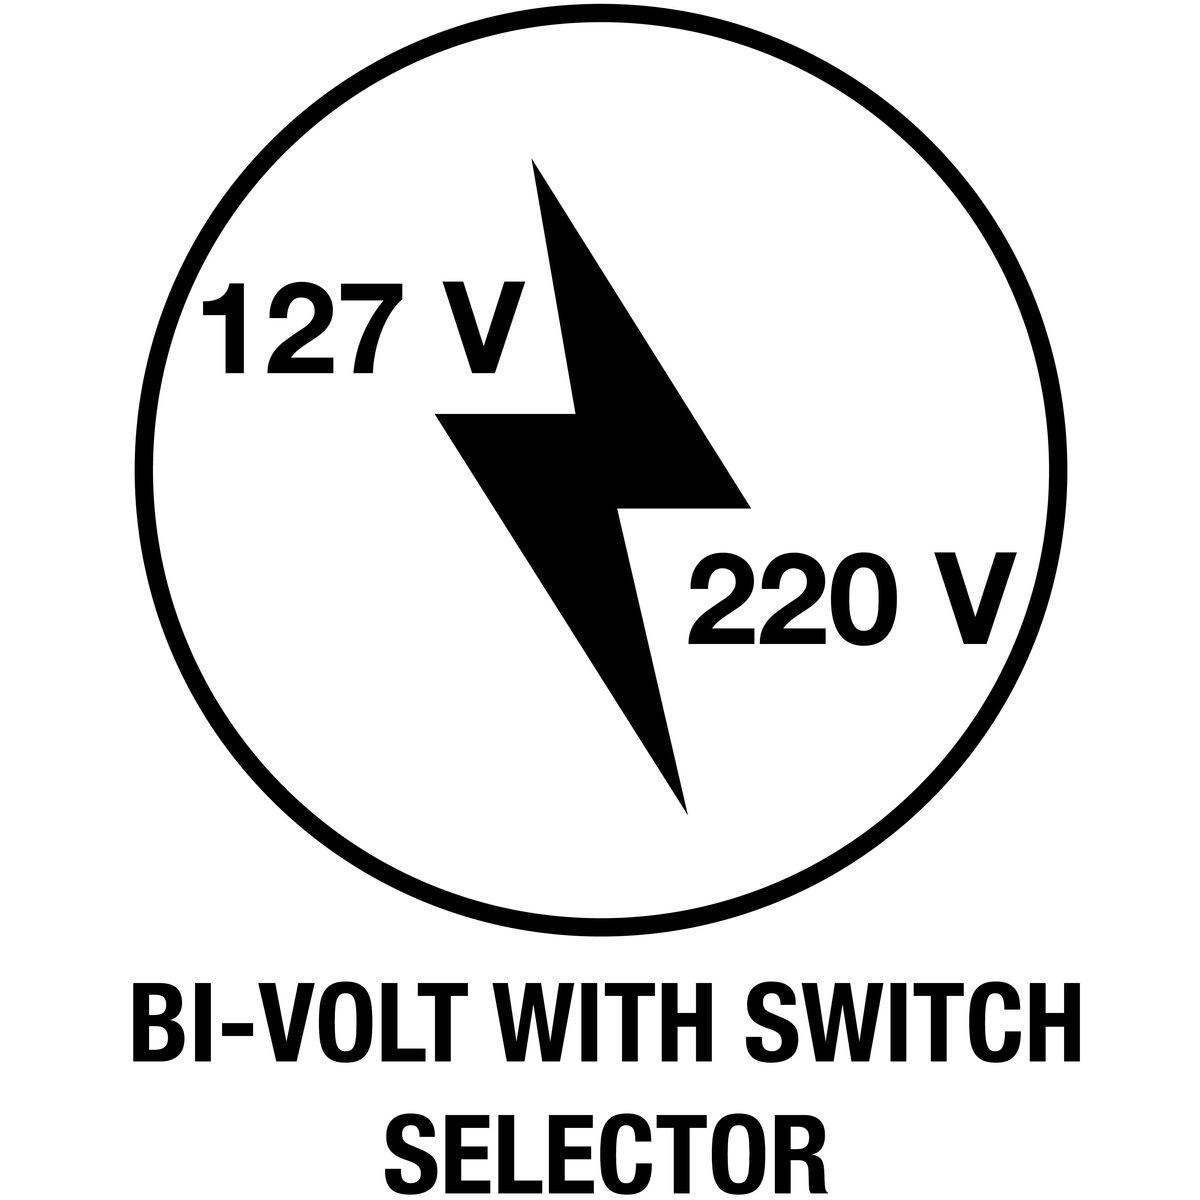 Tramontina 260 W Bivolt 5 Bench Grinder Professional Use. Wiring. Br Tool Bench Grinder Wiring Diagram At Scoala.co